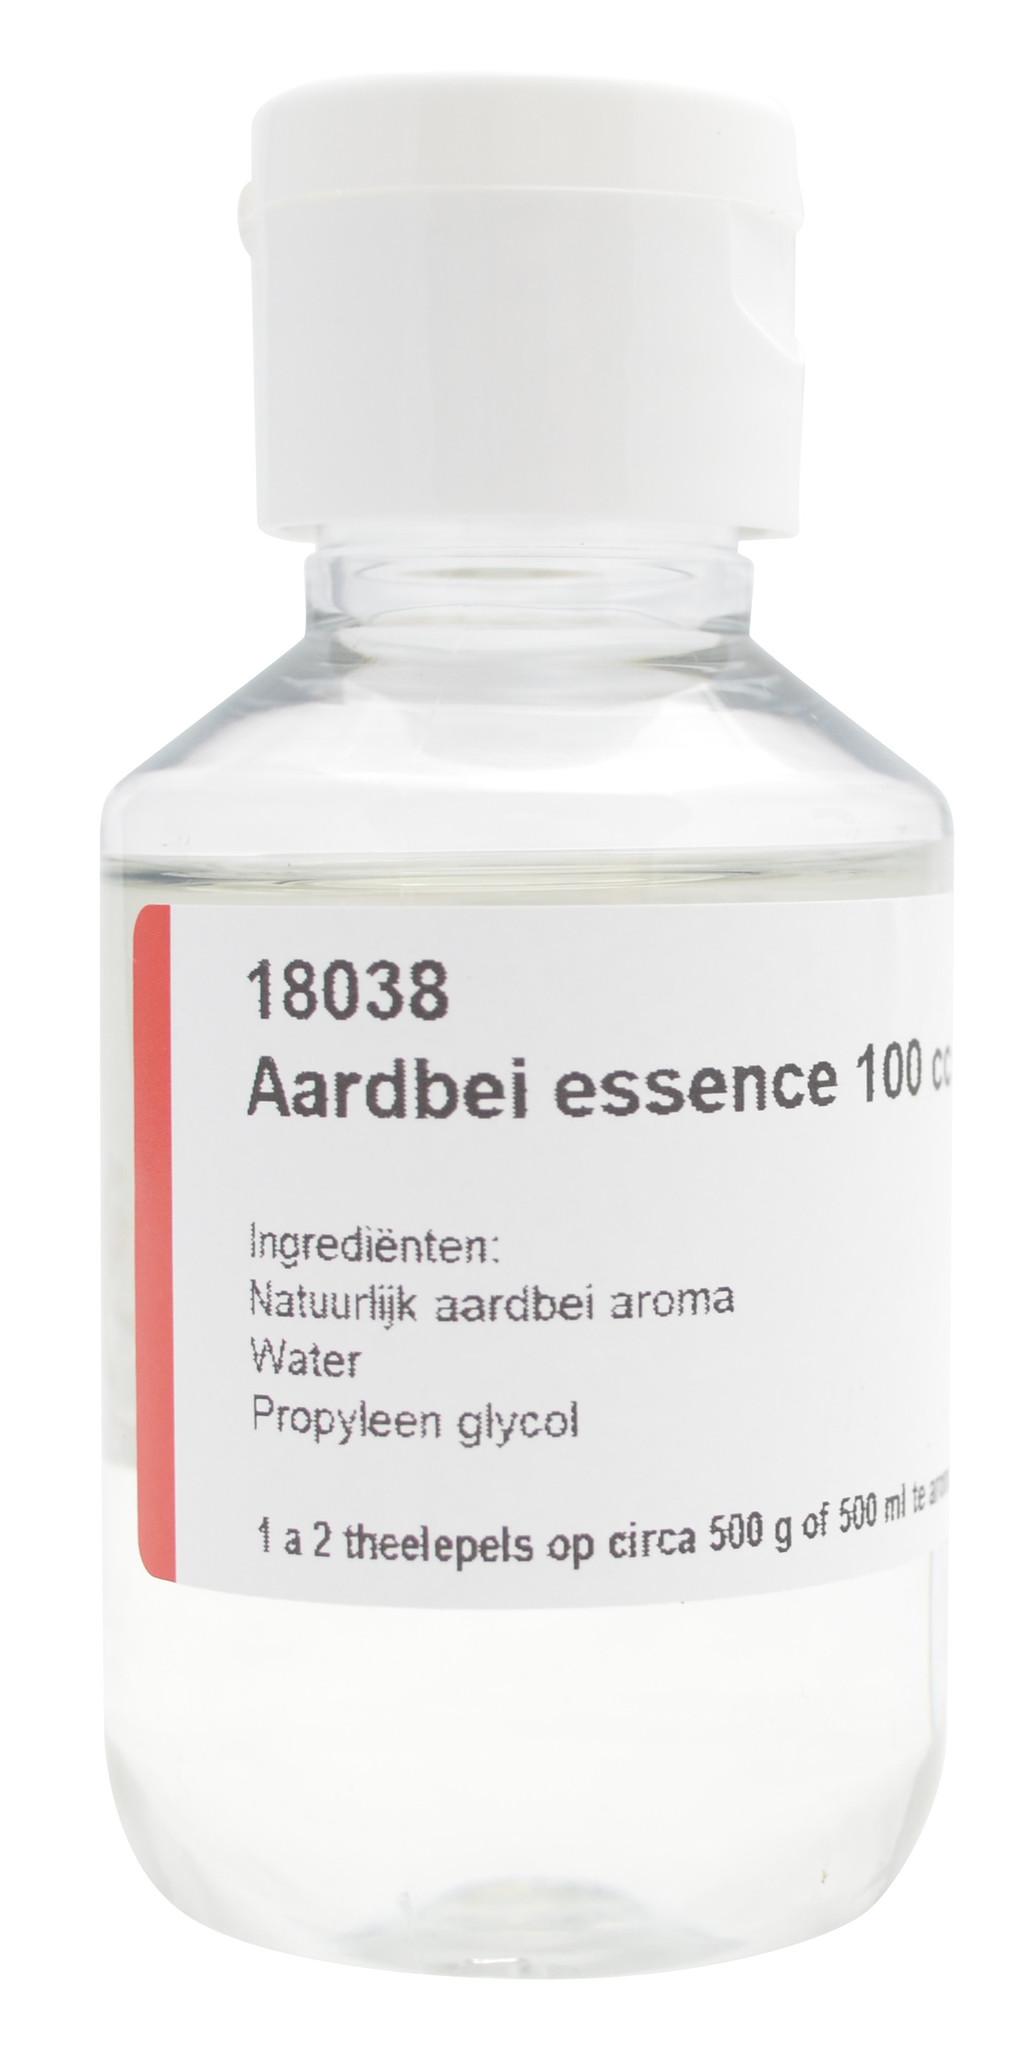 Aardbei essence 100 cc